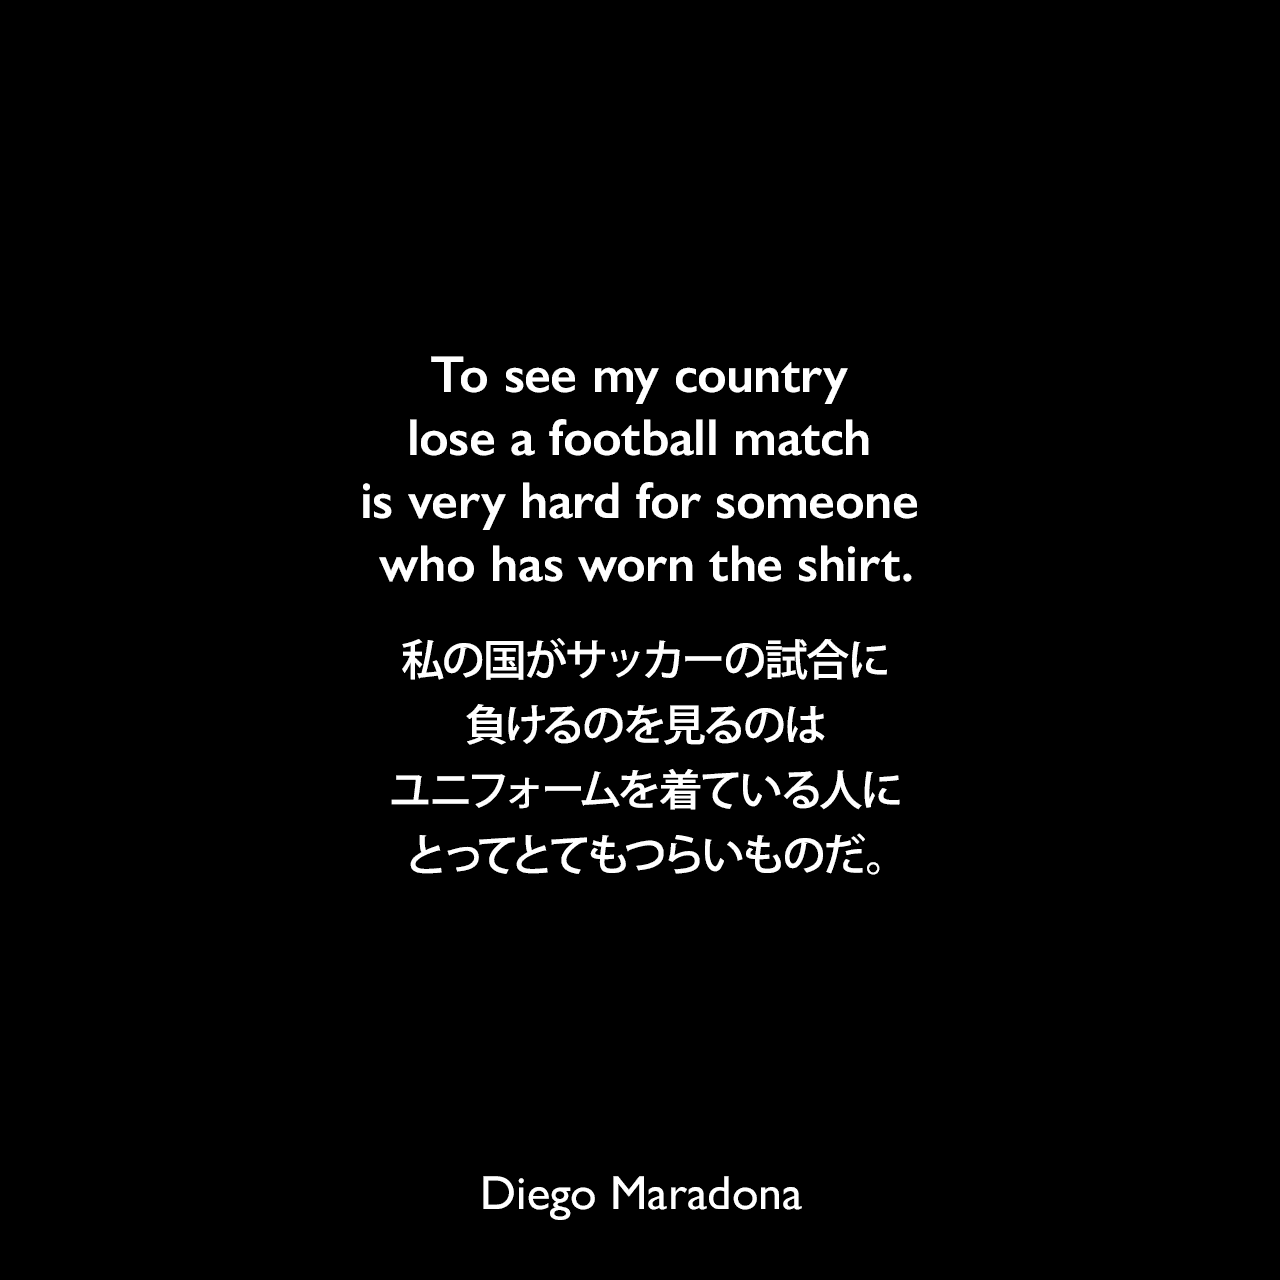 To see my country lose a football match is very hard for someone who has worn the shirt.私の国がサッカーの試合に負けるのを見るのは、ユニフォームを着ている人にとってとてもつらいものだ。Diego Maradona